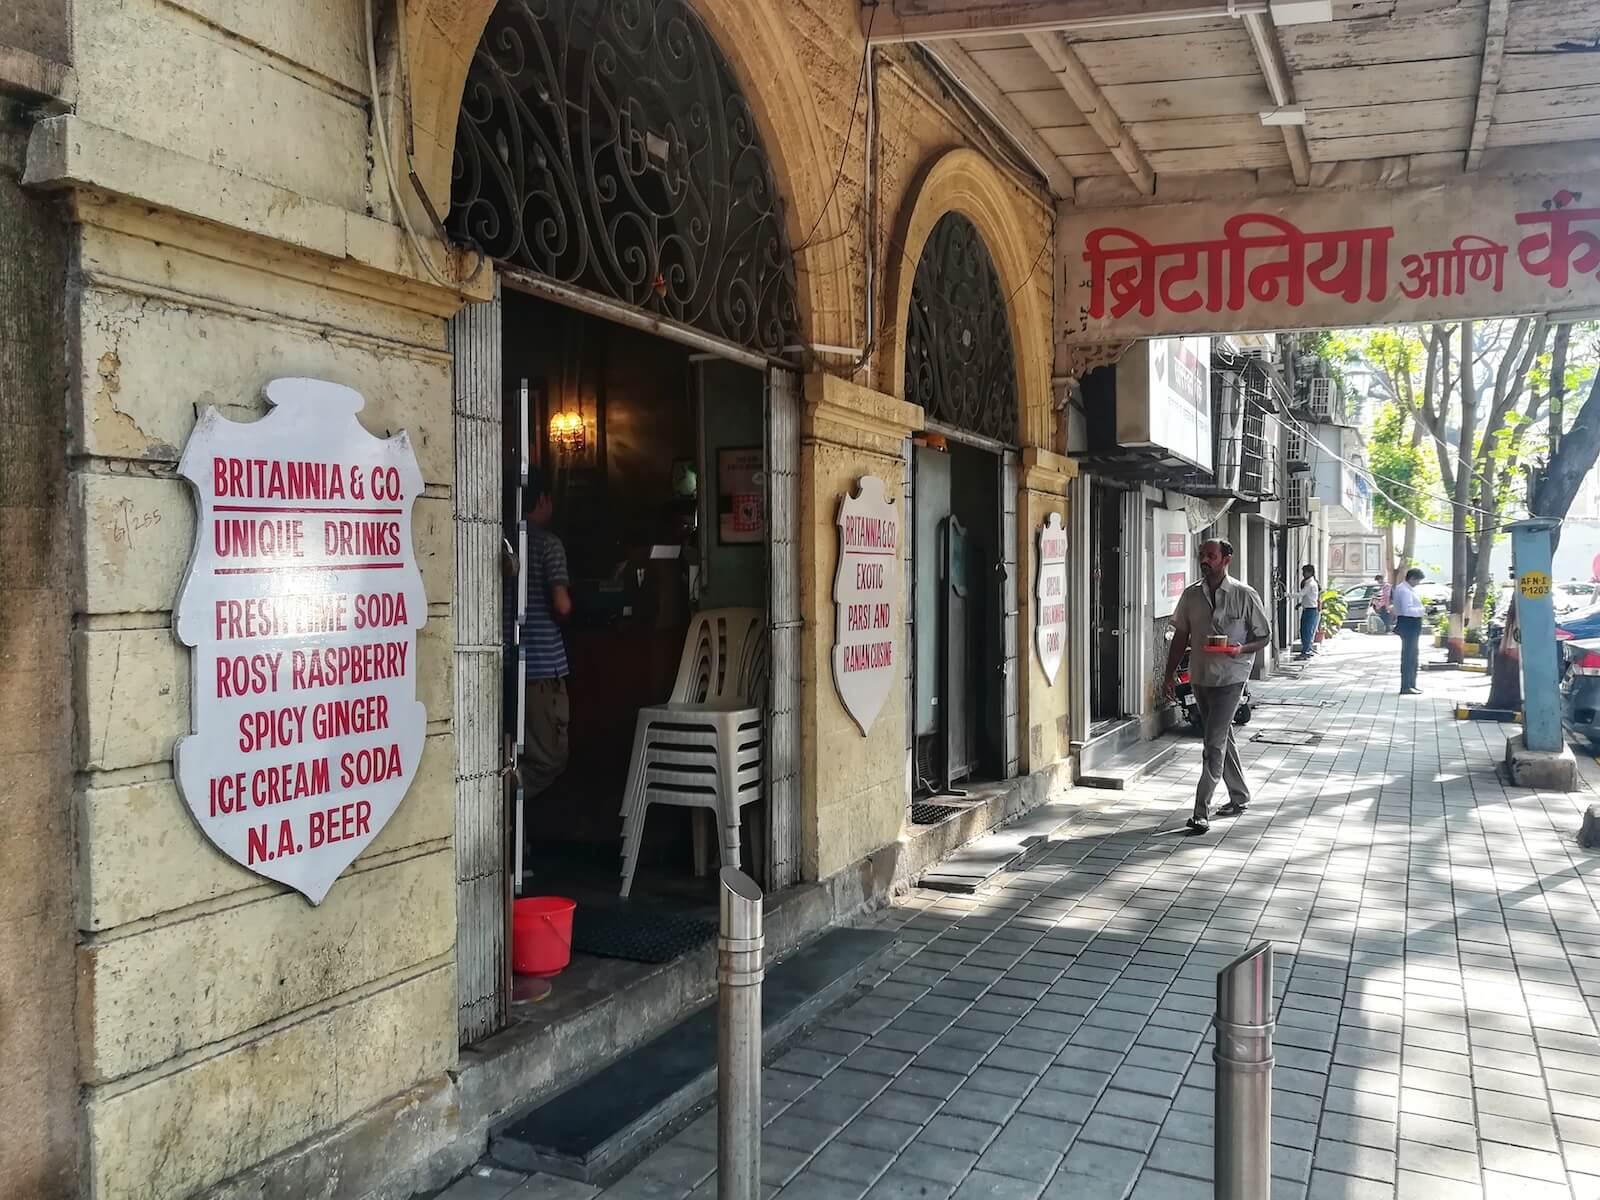 Entrance to Britannia & Co. Restaurant, Mumbai. Photo © Karl Rock.